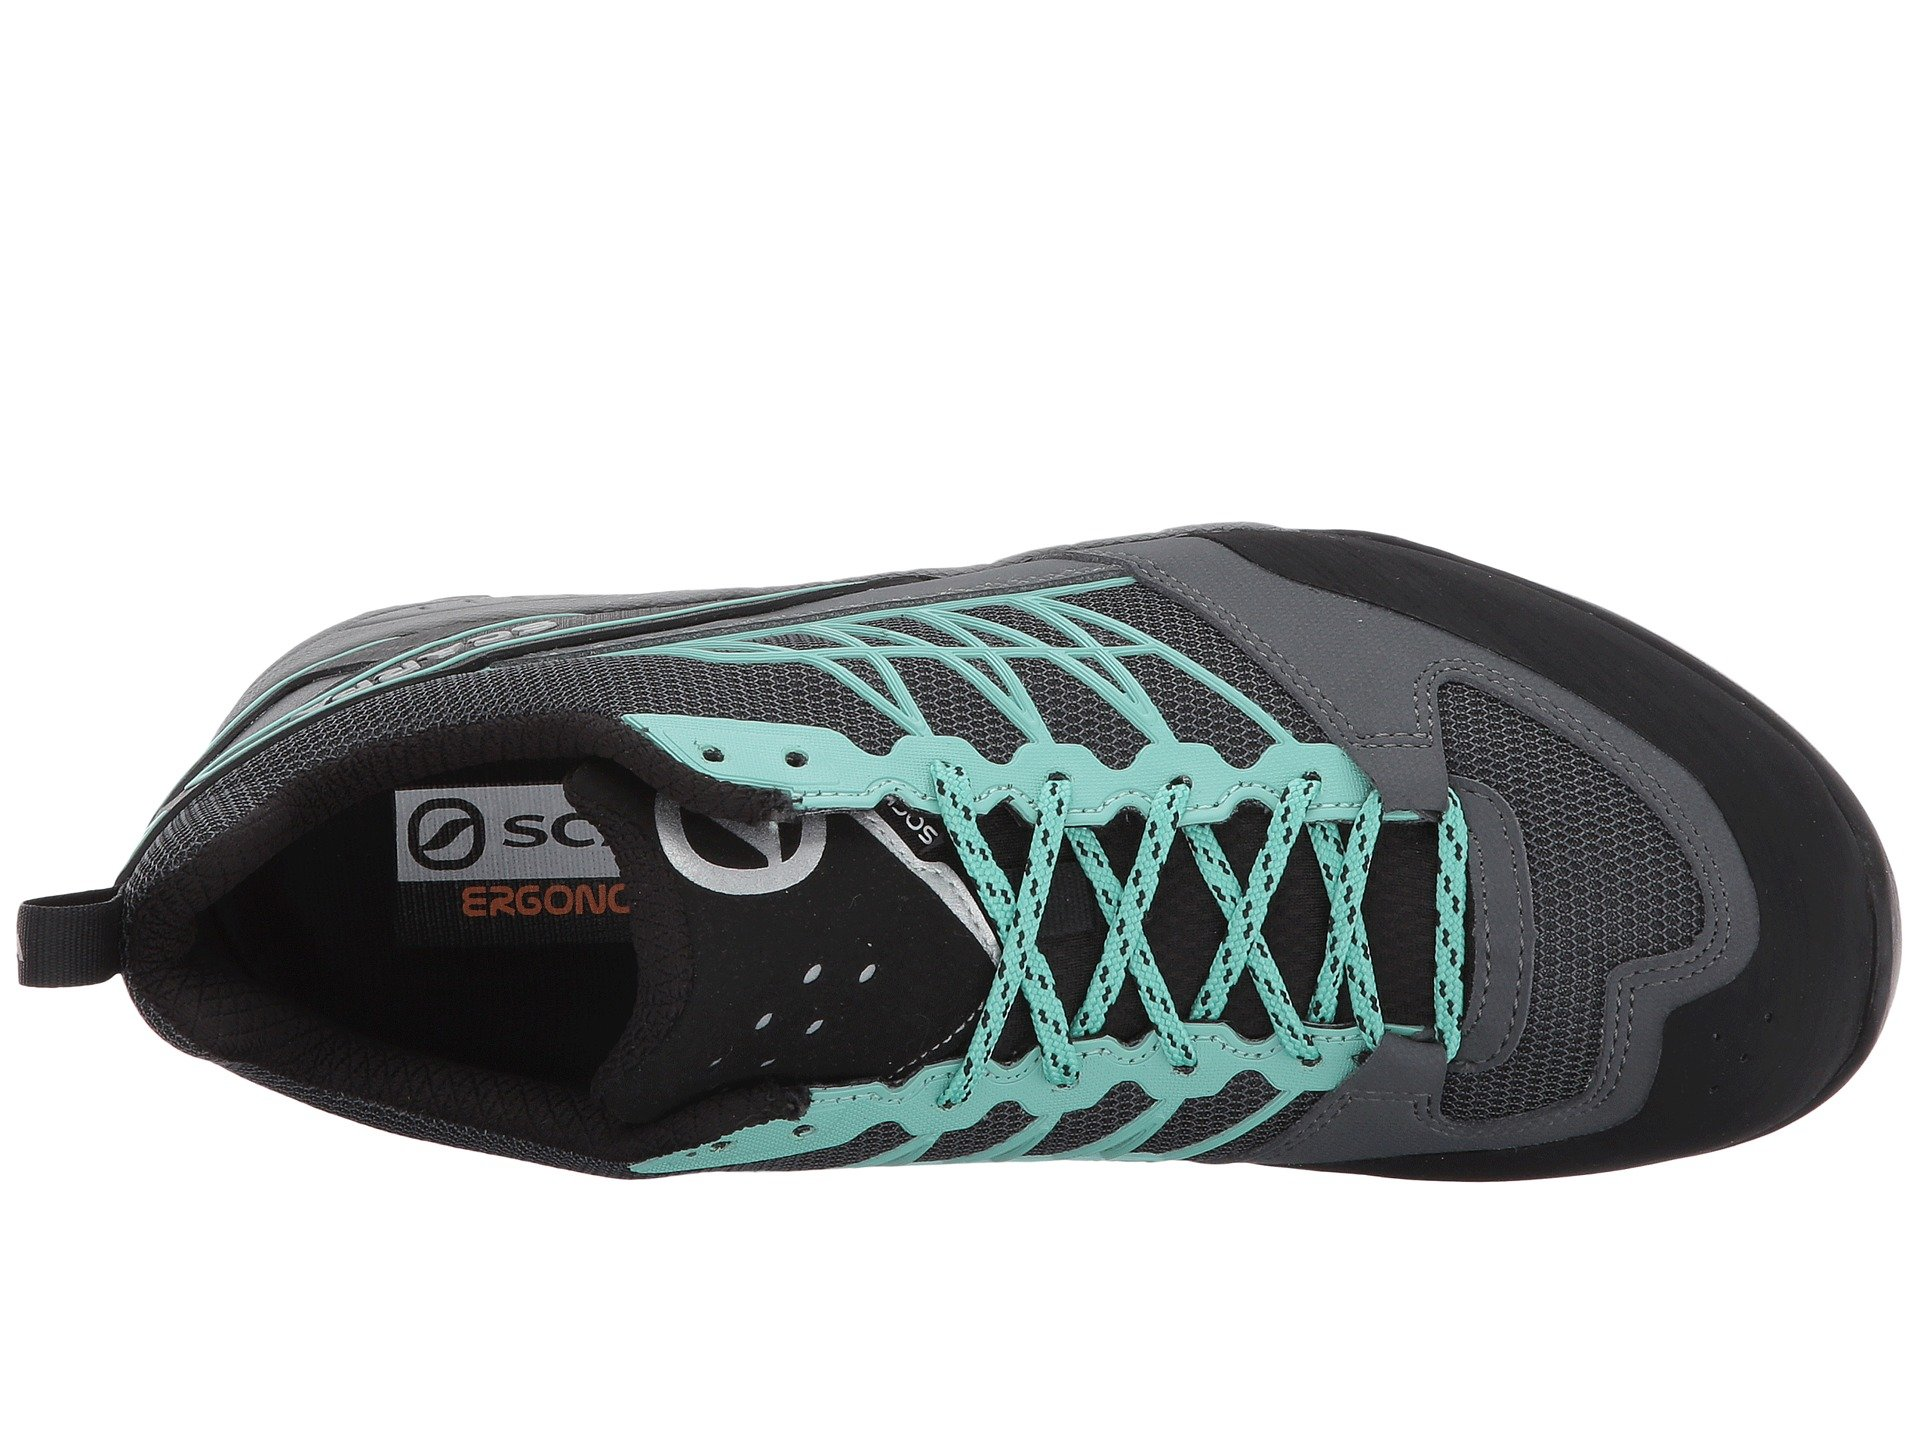 Scarpa Men S Epic Lite Hiking Shoe